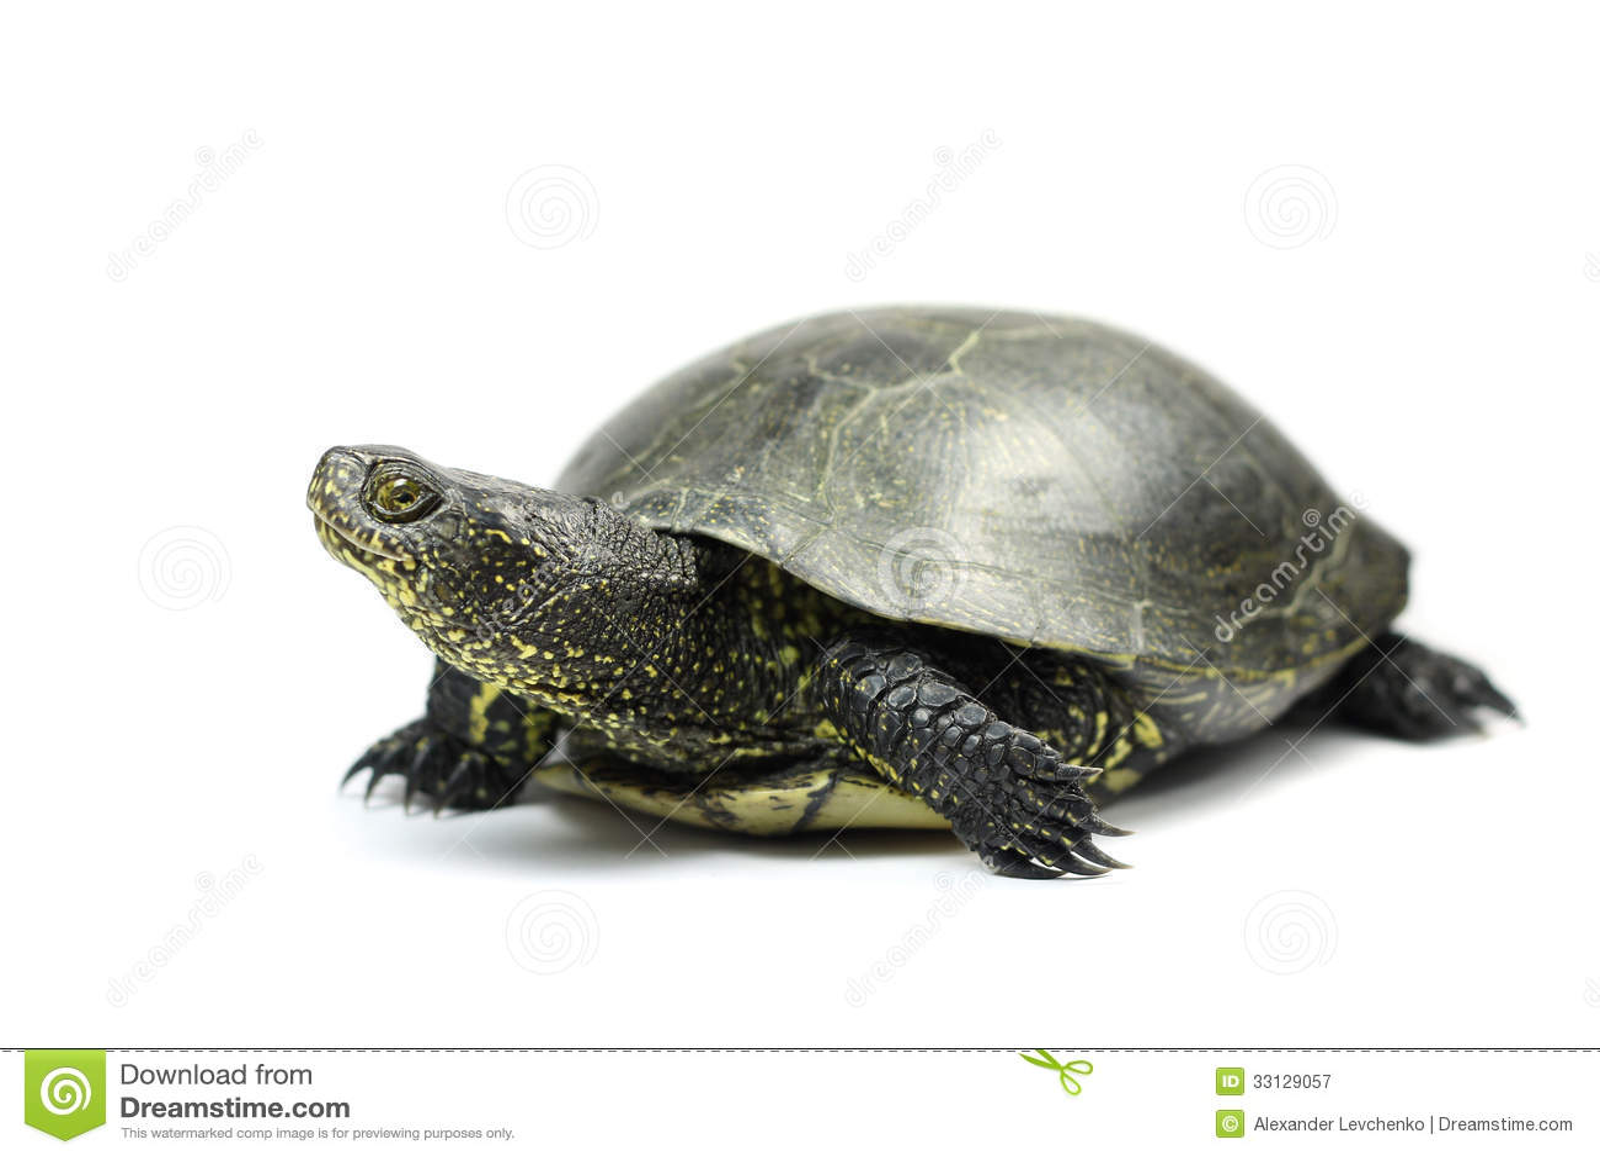 turtle white background - photo #35